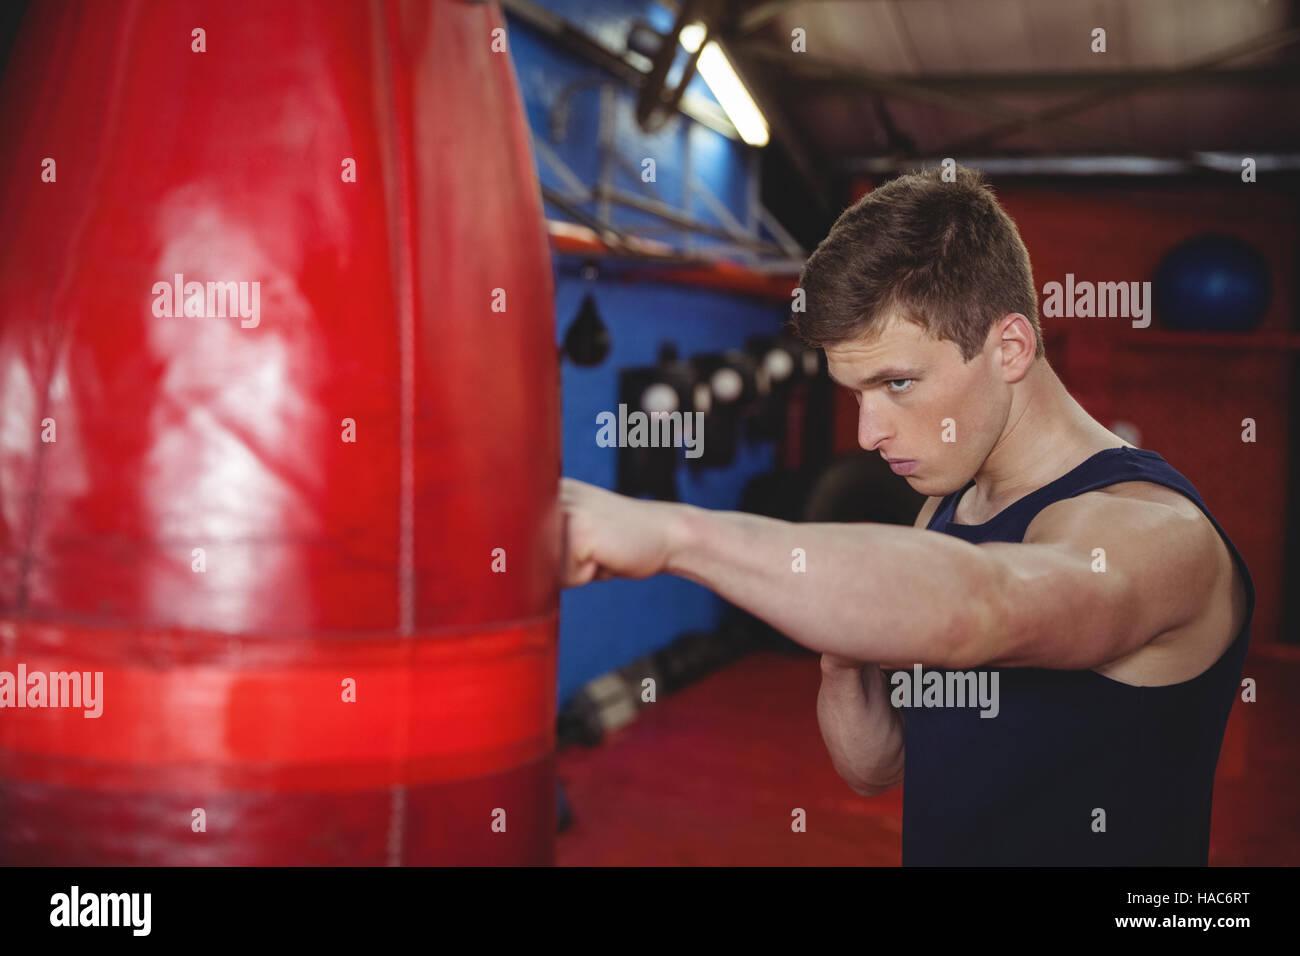 Boxer practicing boxing on punching bag - Stock Image